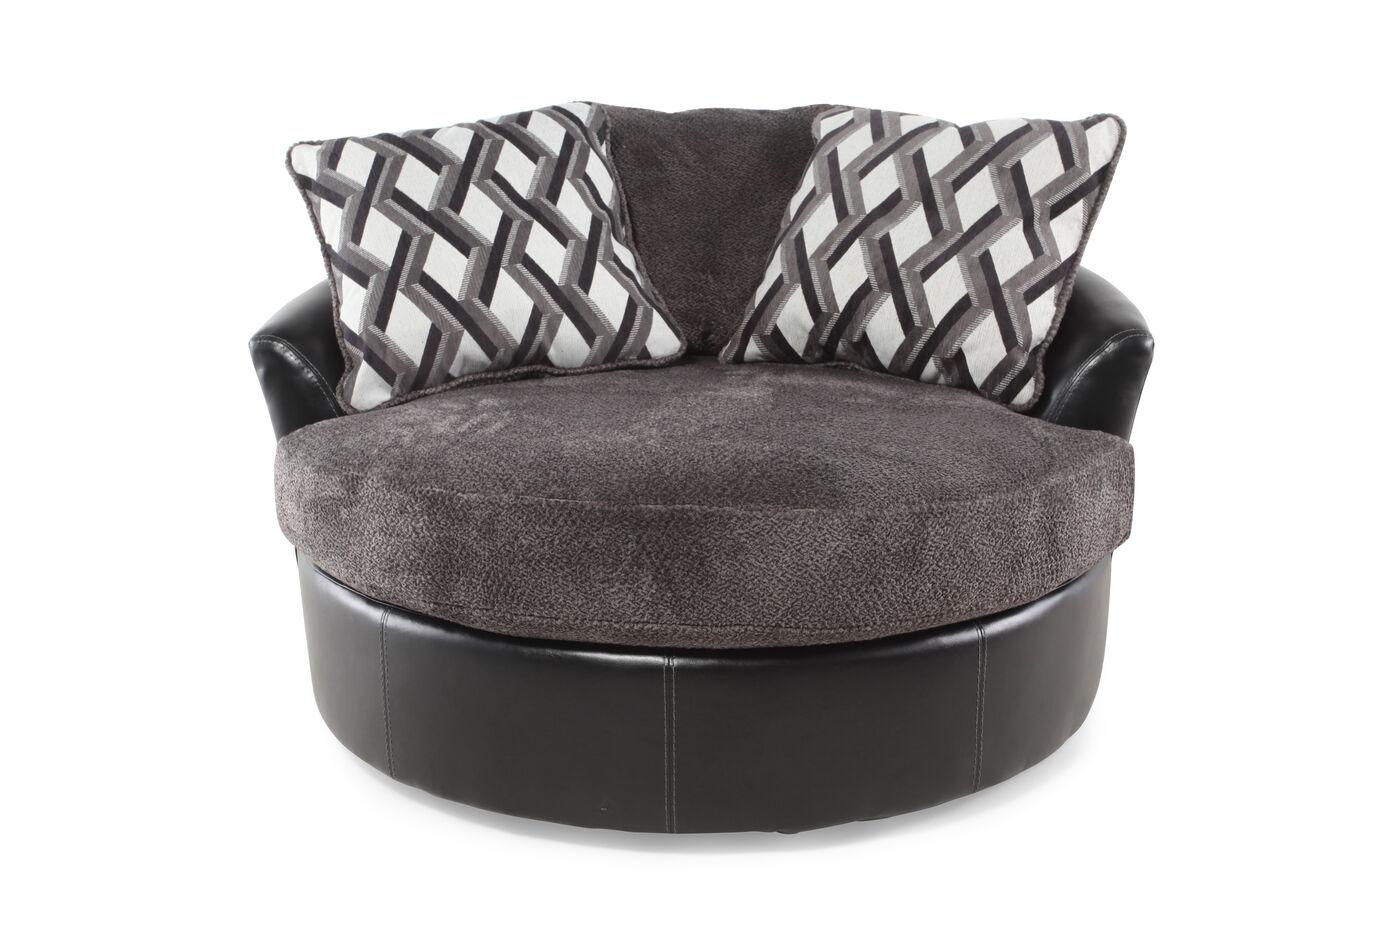 Ashley oversized swivel accent chair - Ashley Kumasi Smoke Oversized Swivel Accent Chair